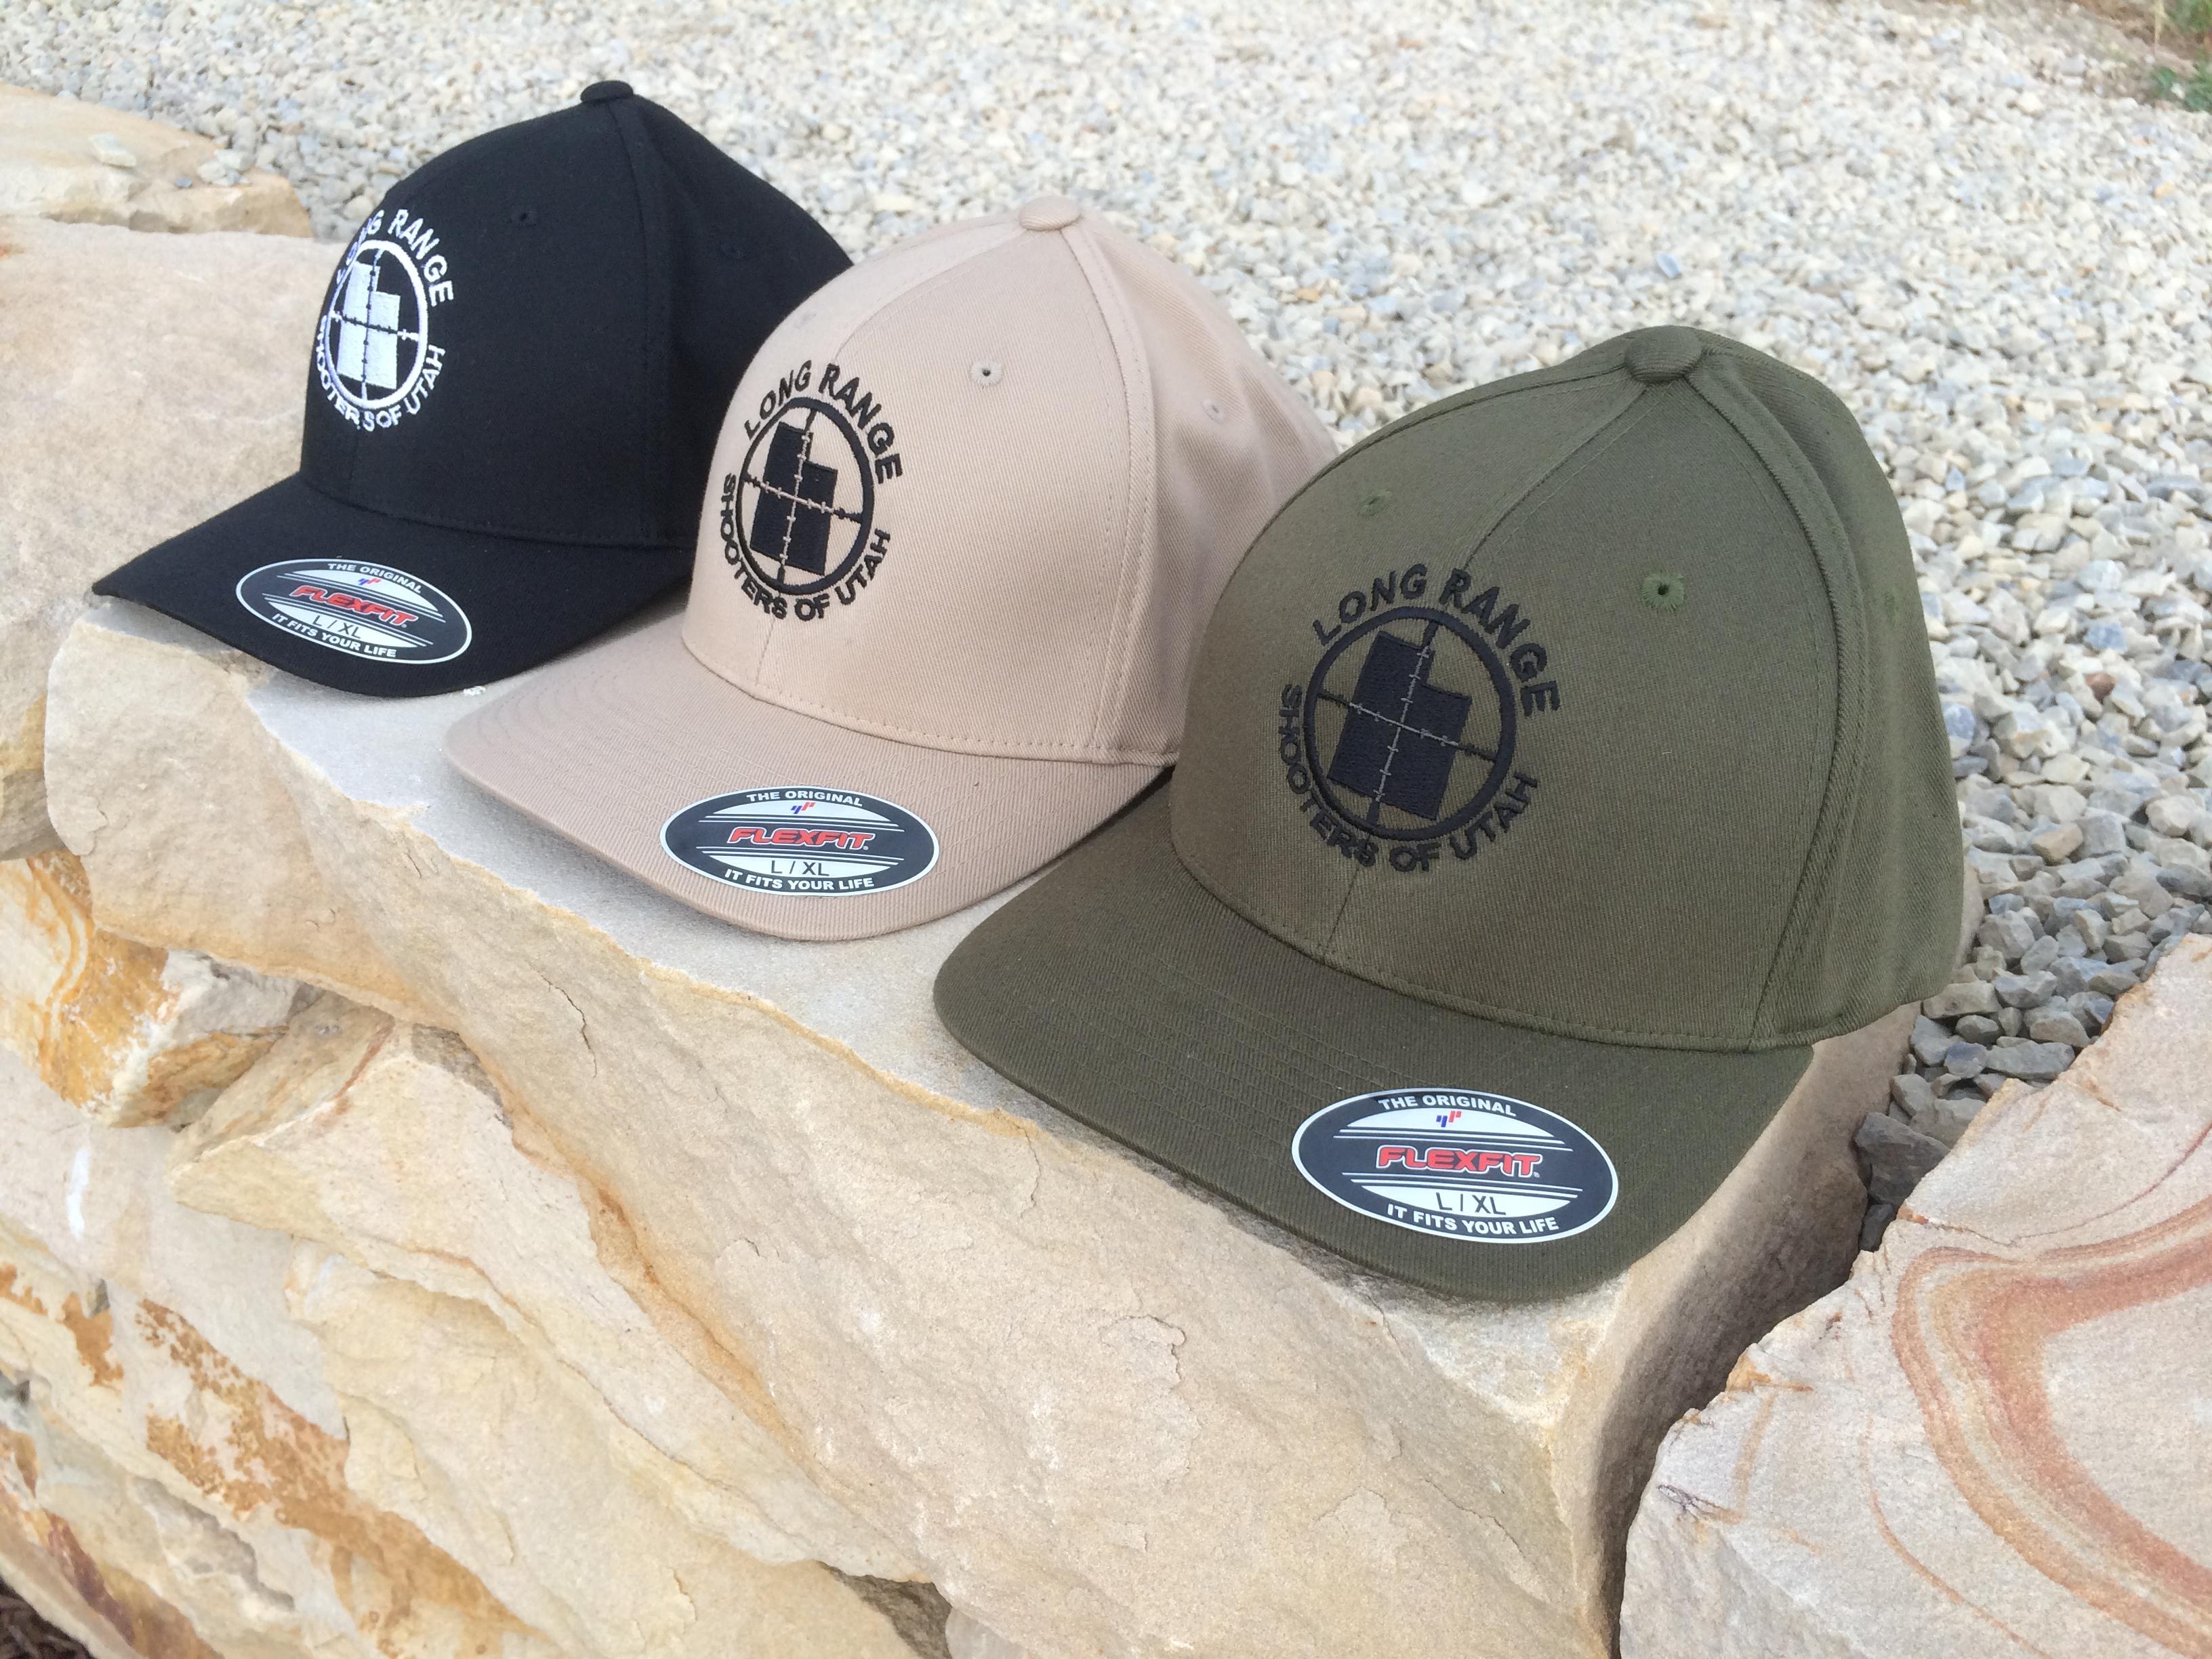 Original Lrsu Embroidered Flex Fit Brand Hat Long Range